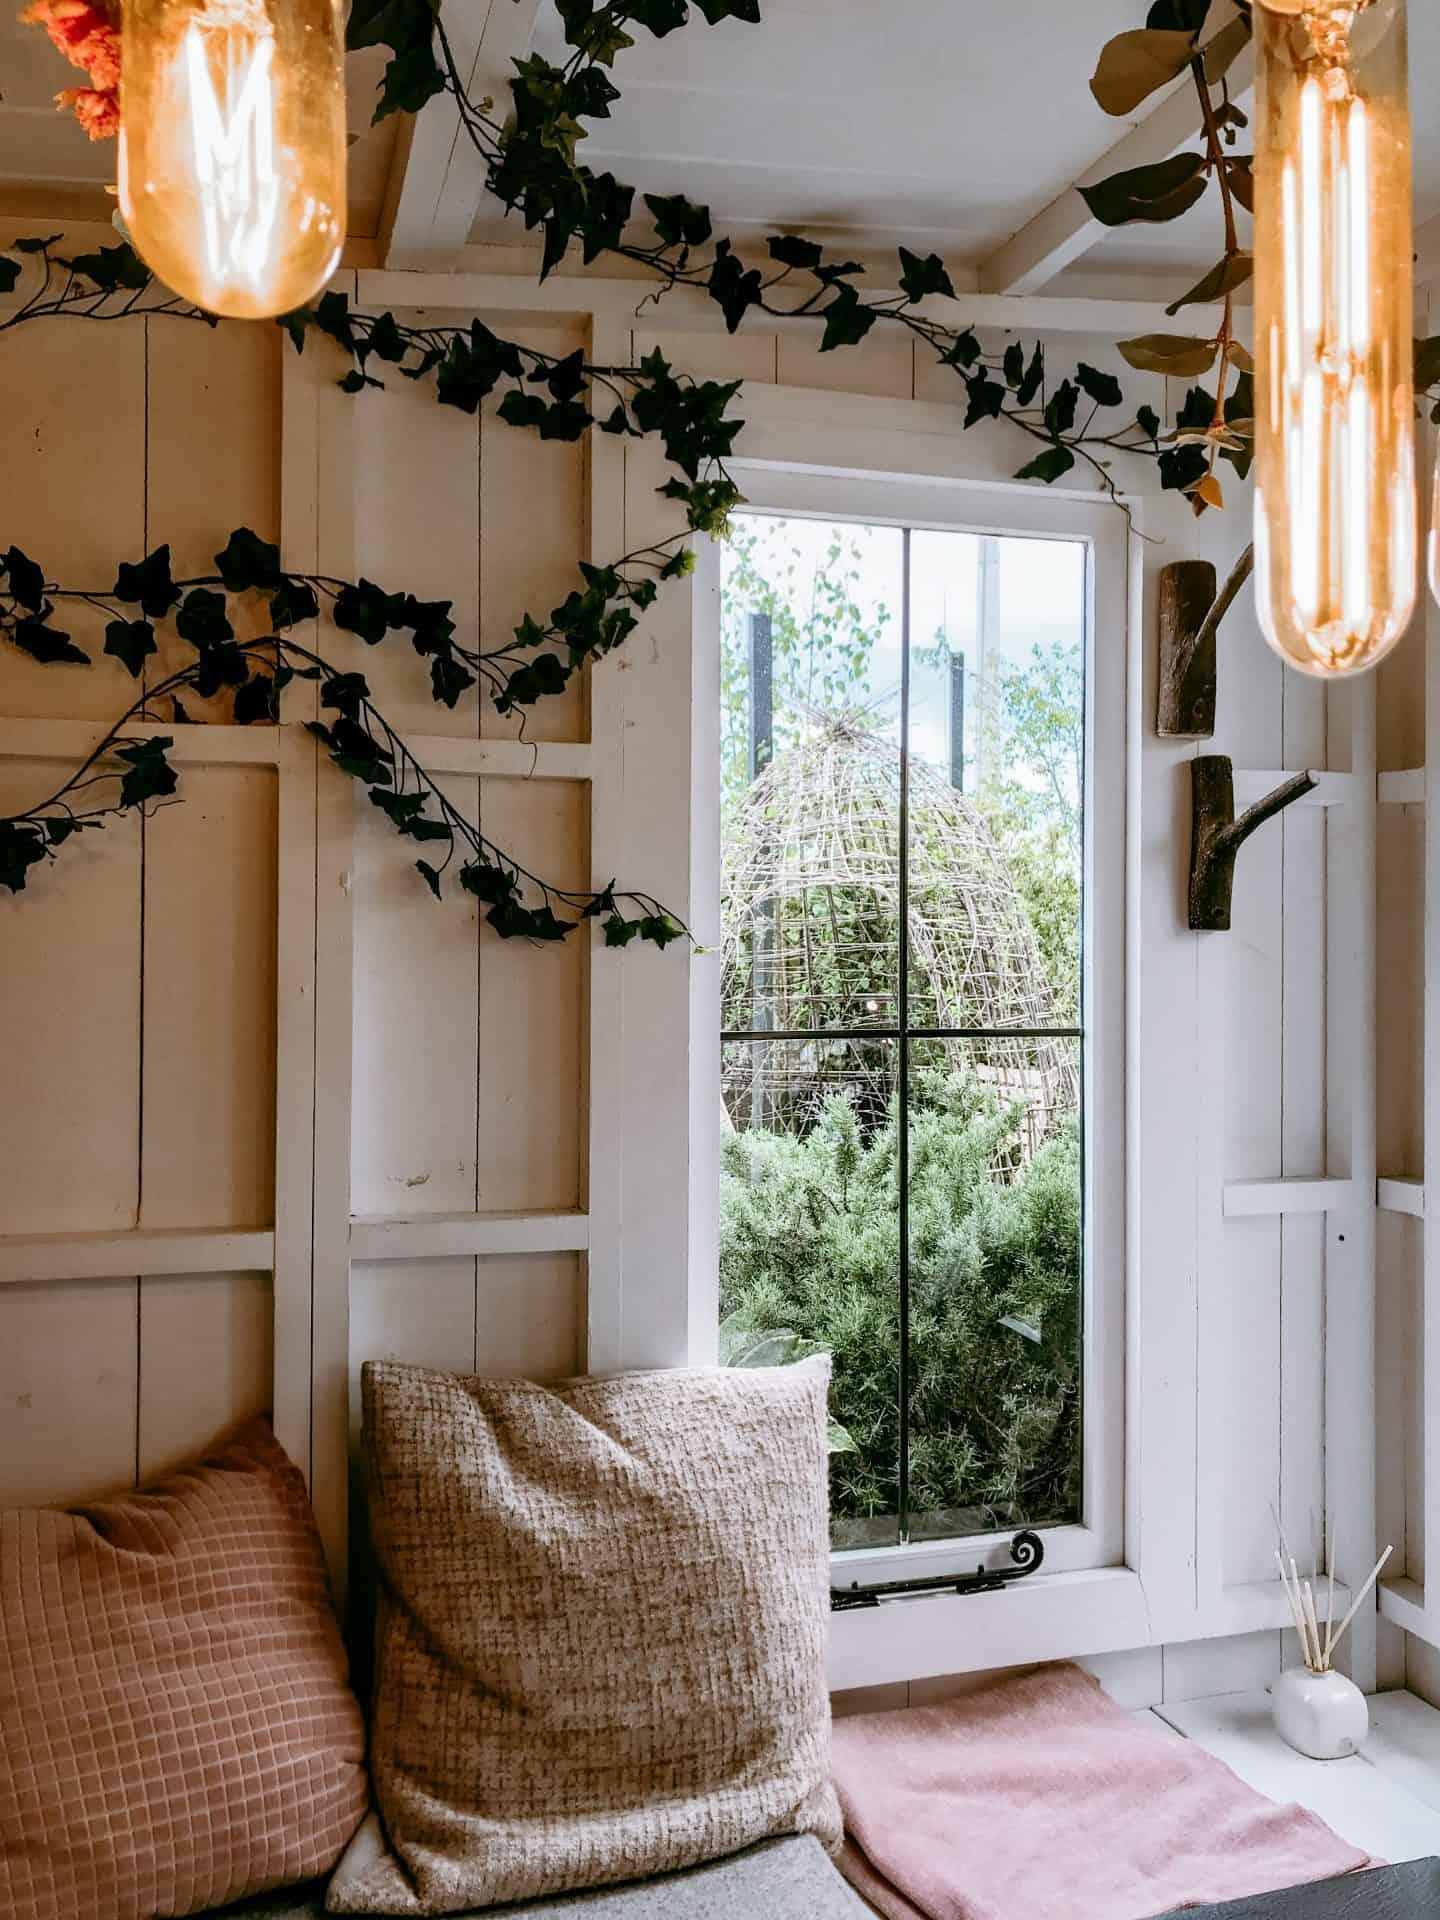 Inside The Garden Den at John Lewis' Roof Garden London